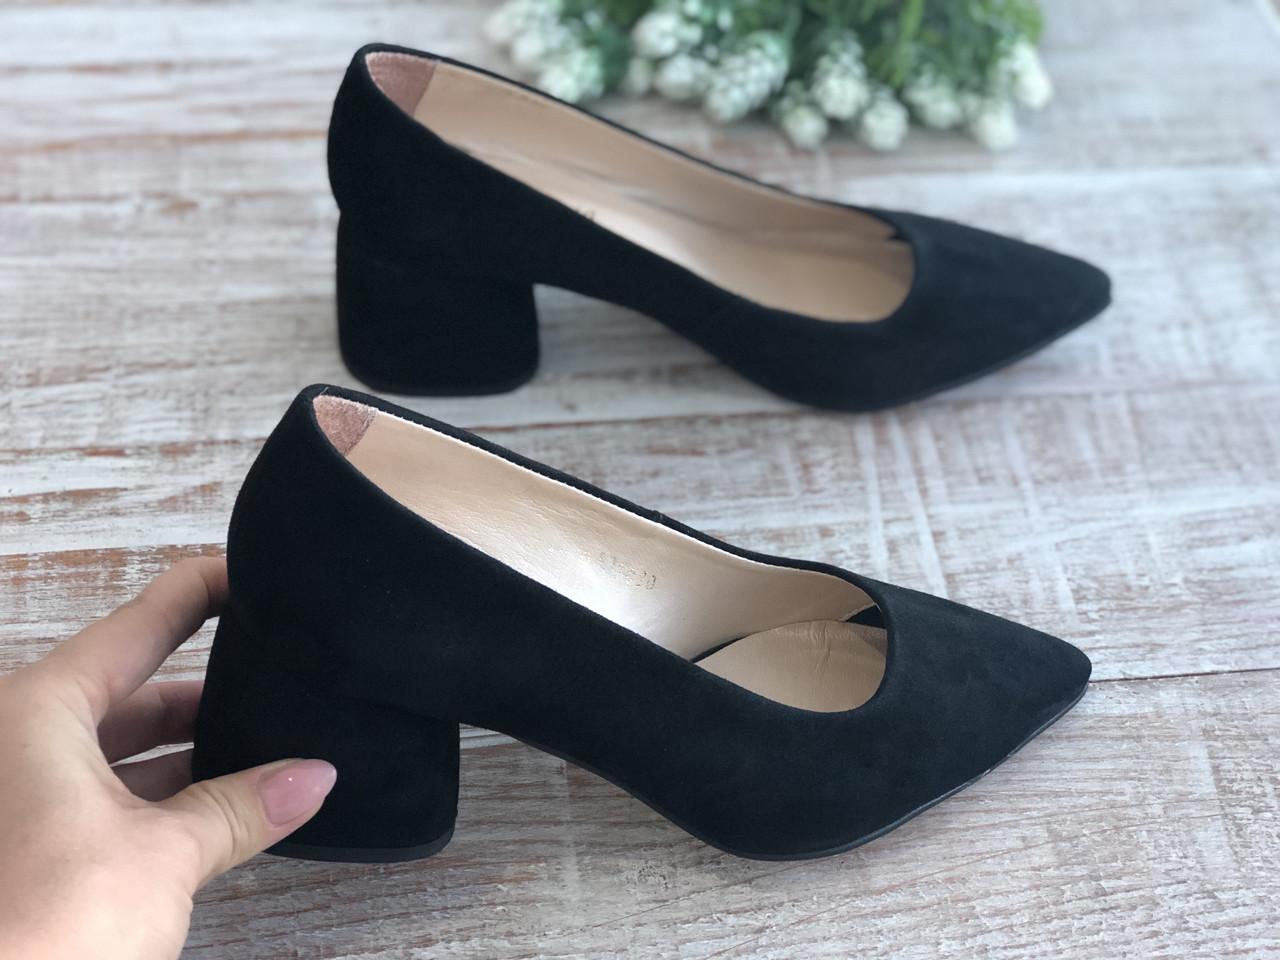 Кожаные женские туфли Маріні 56 ч/з размеры 36-40